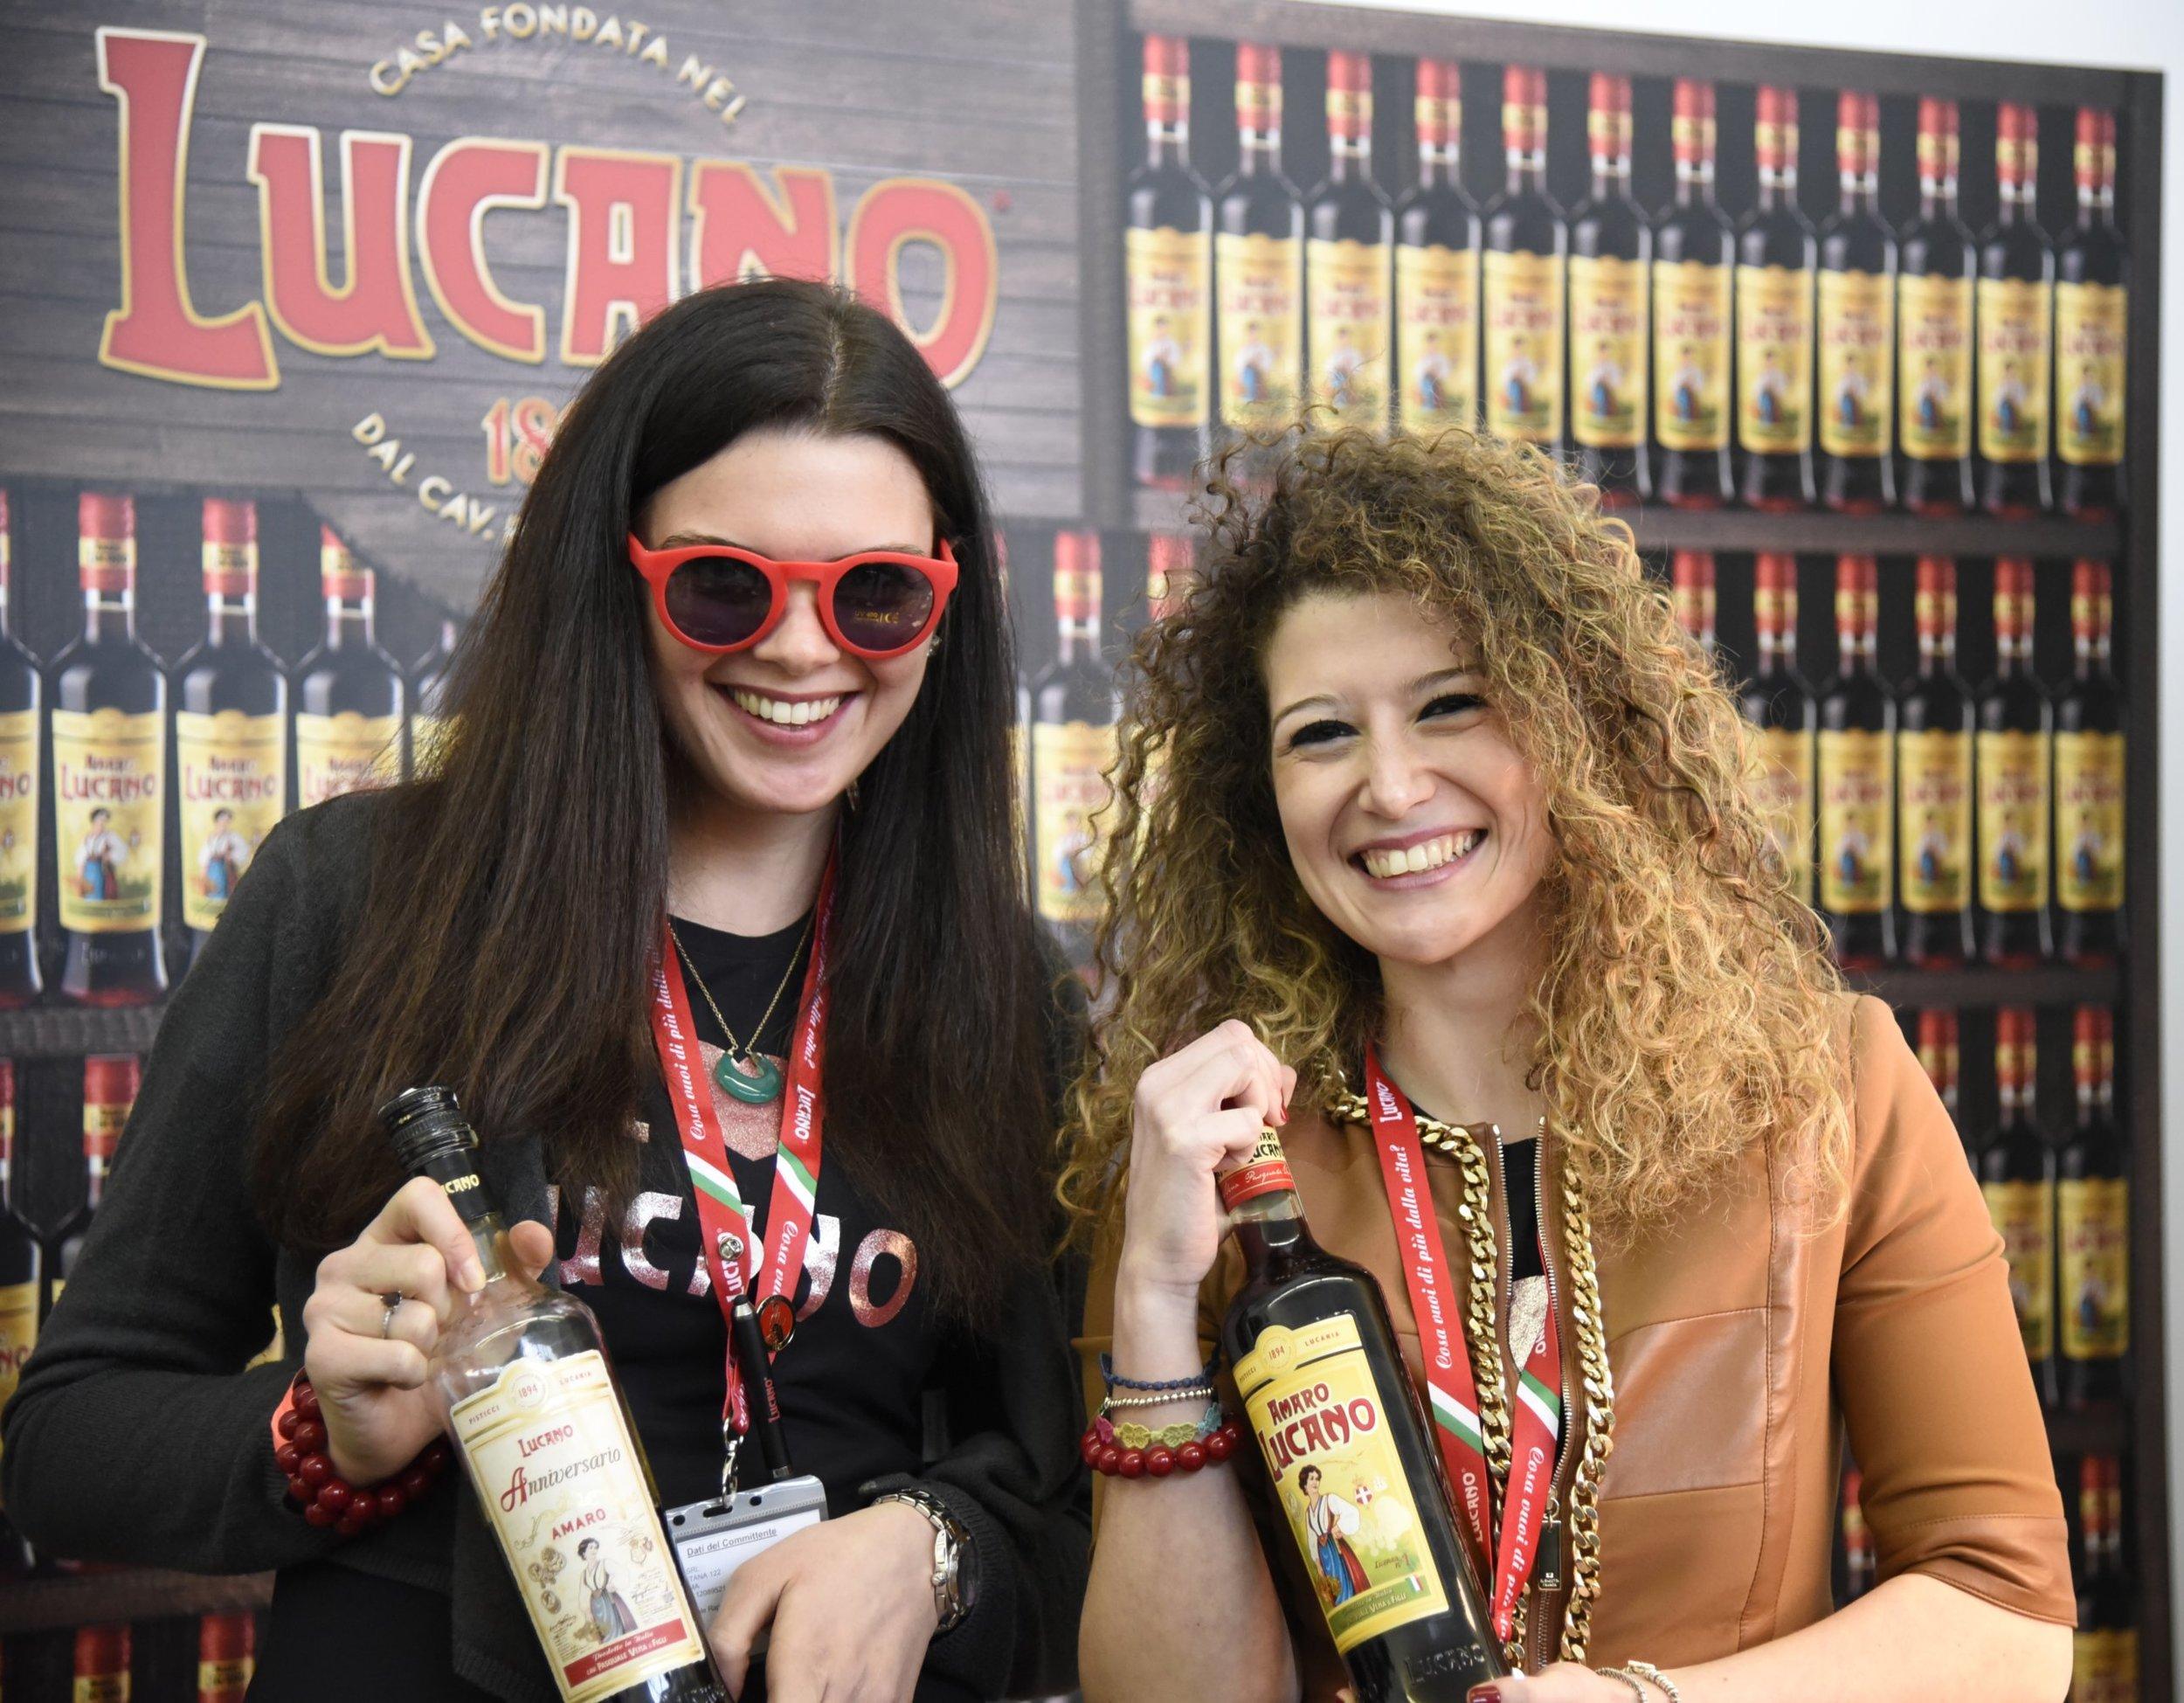 The girls at Lucano